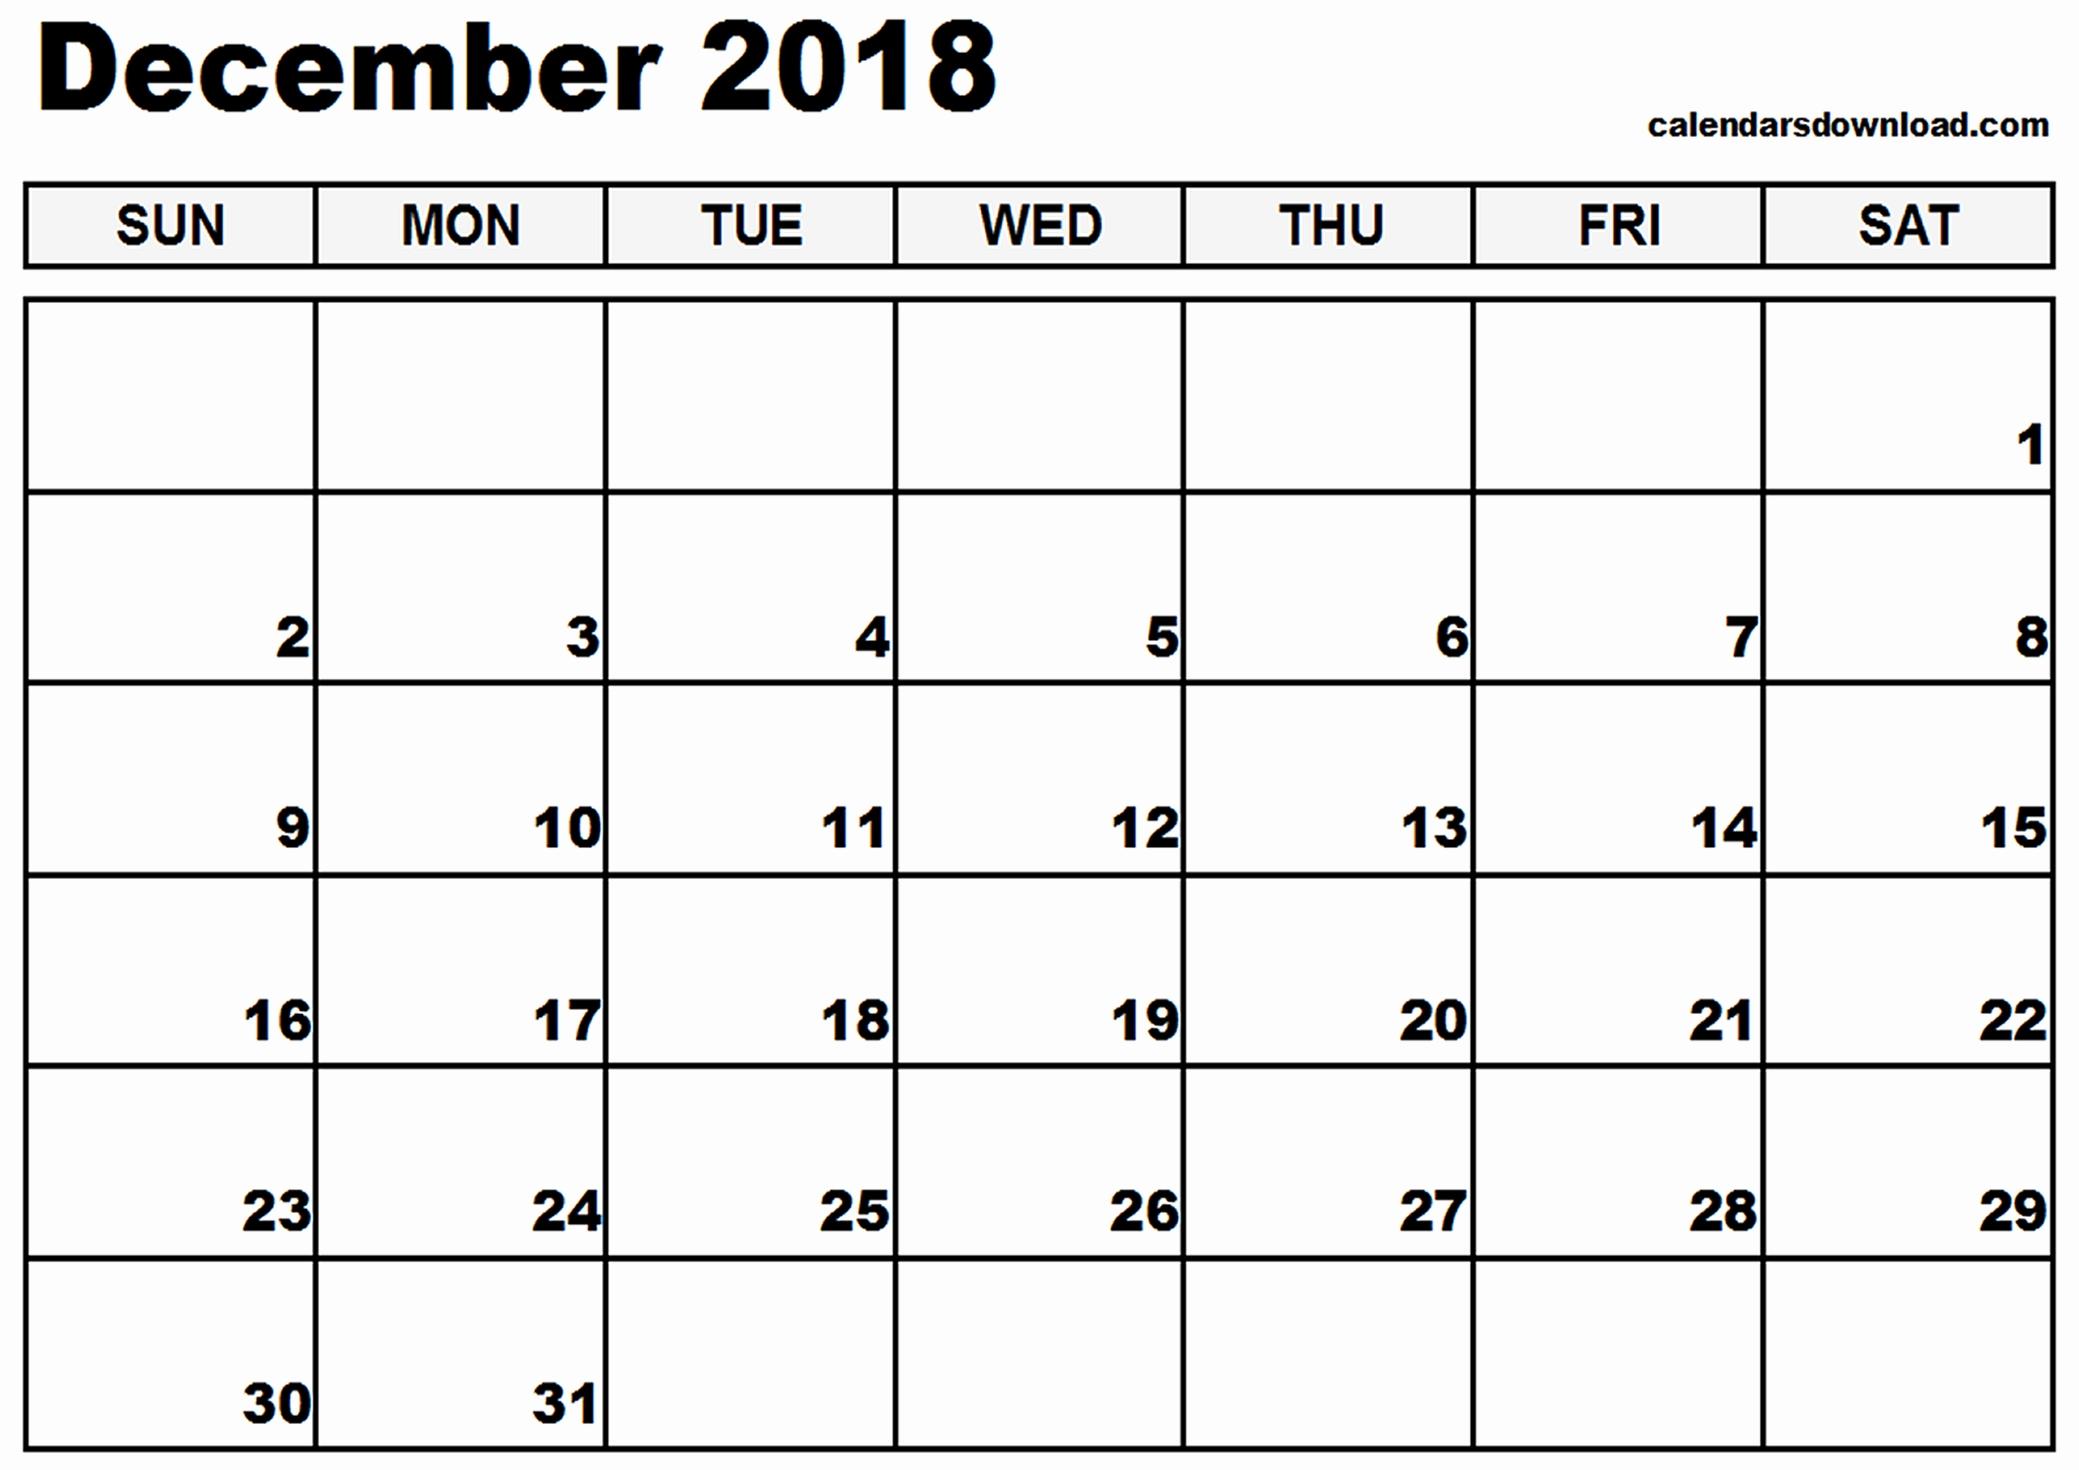 2018 calendar template printable december 2018 printable calendar::December 2018 Calendar Printable Template